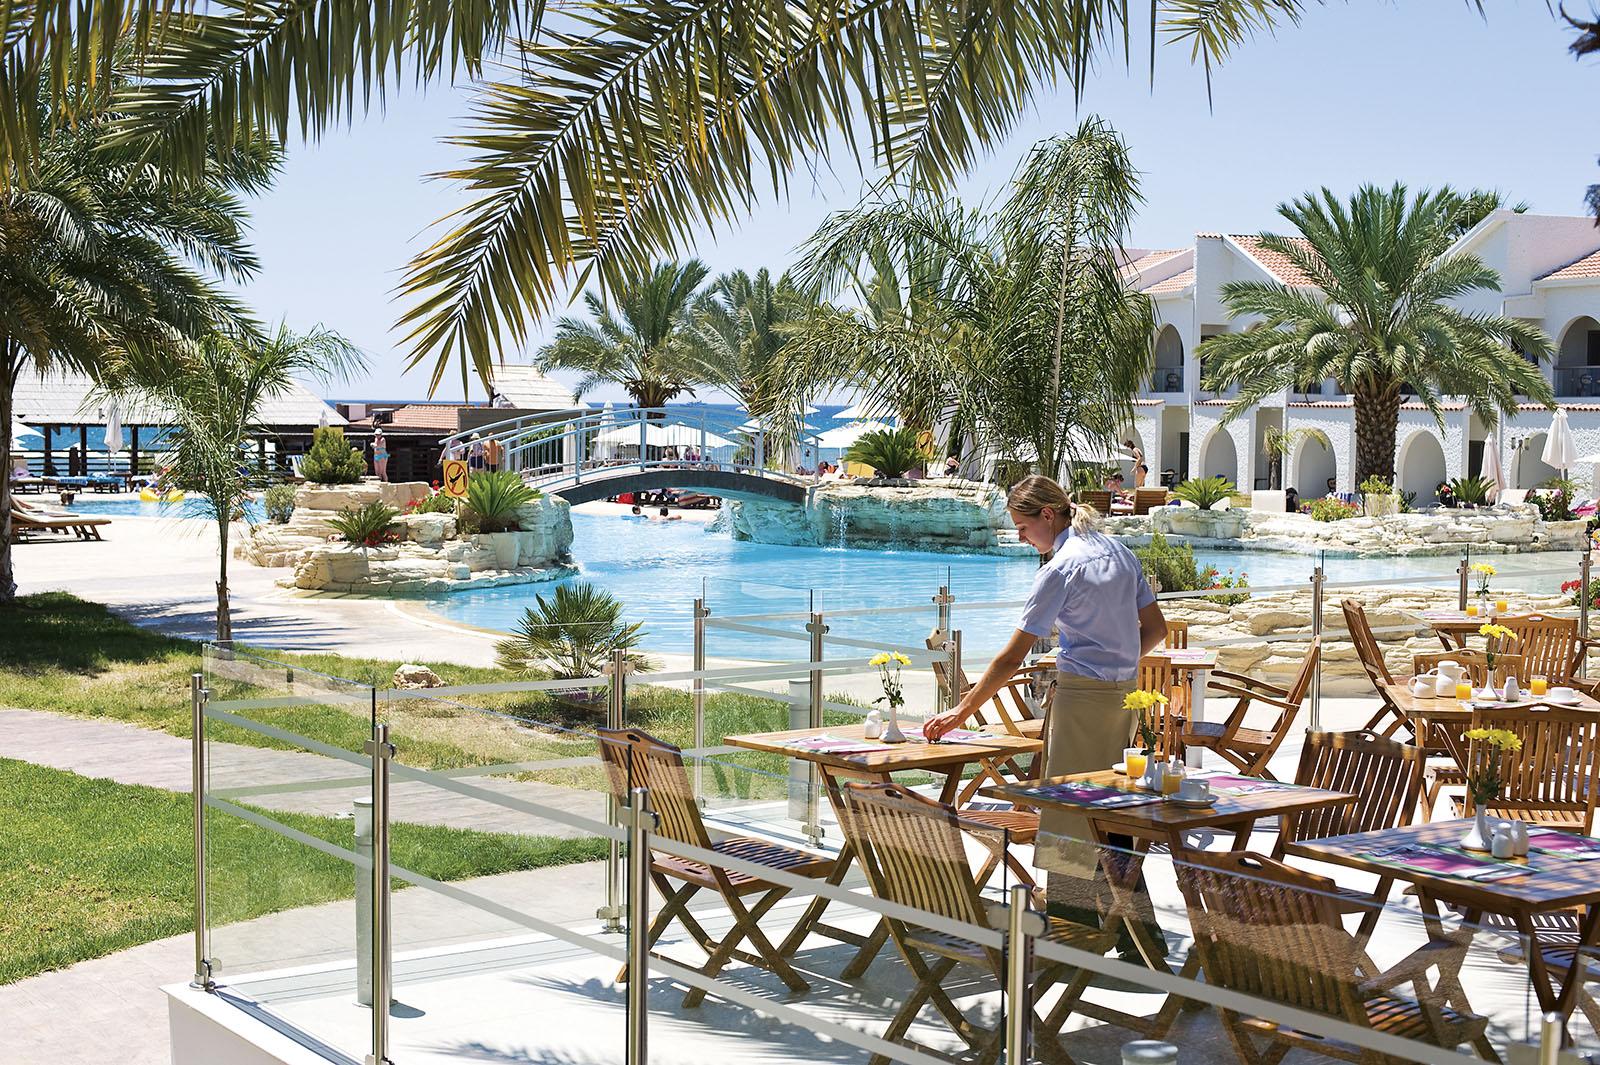 http://www.budavartours.hu/binaries//content/gallery/budavar/locations/accomodations/Ciprus/Larnaca/Princess+Beach+Hotel/princess_beach_hotel_larnaca_2.jpg